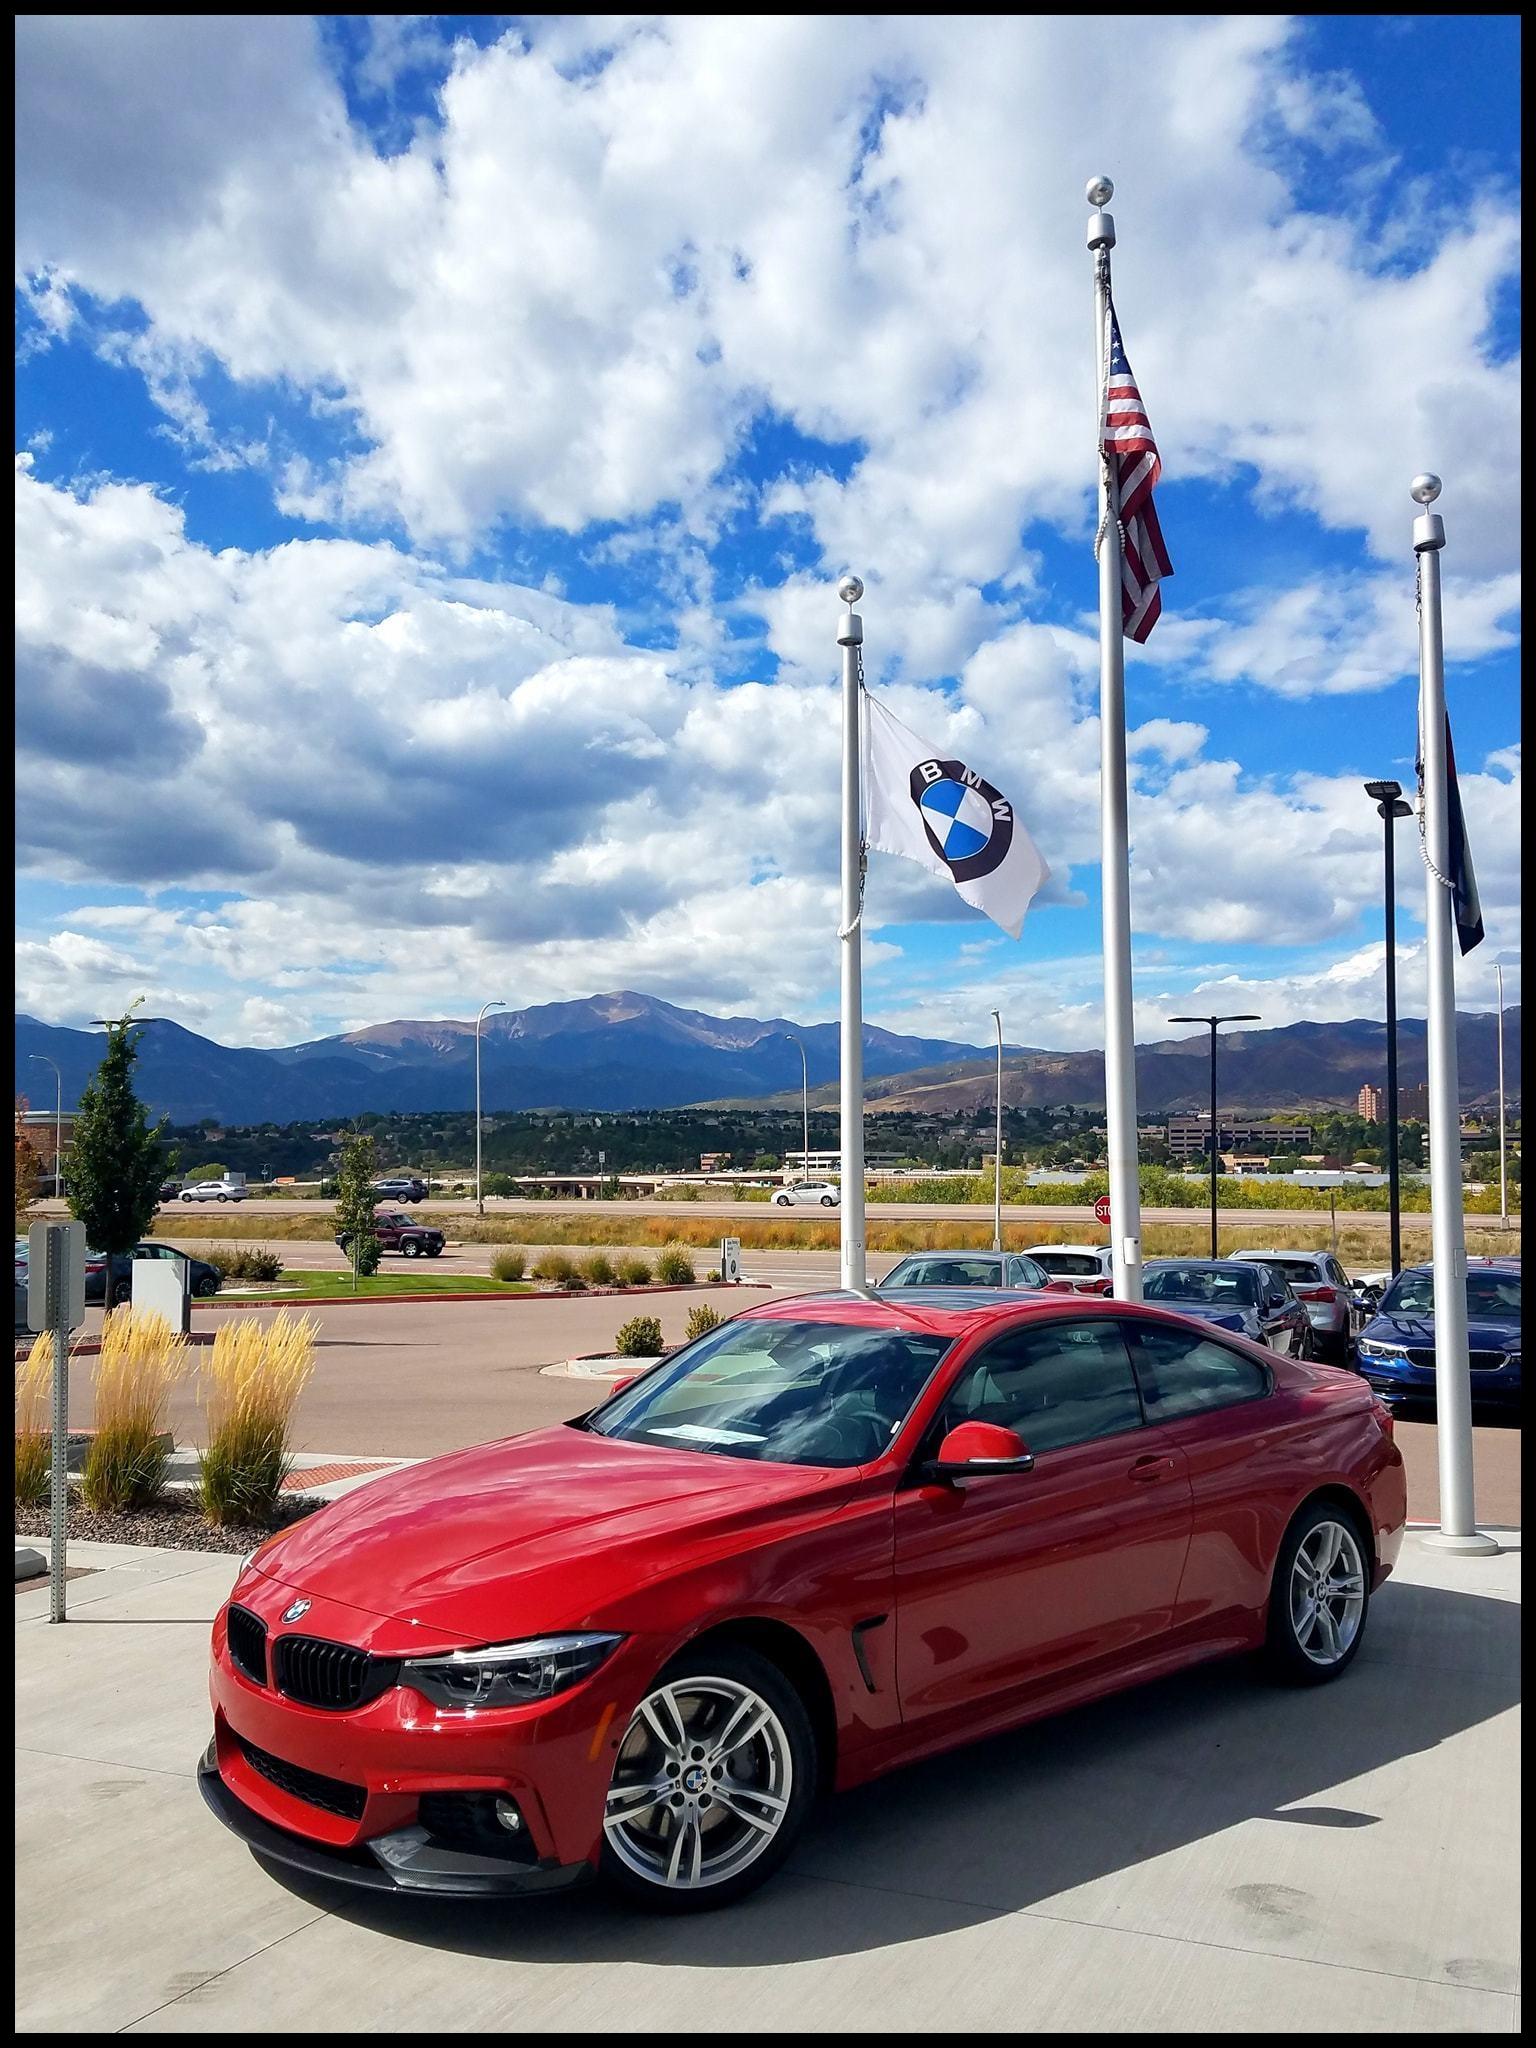 Winslow BMW has an immediate job opening for an Automotive